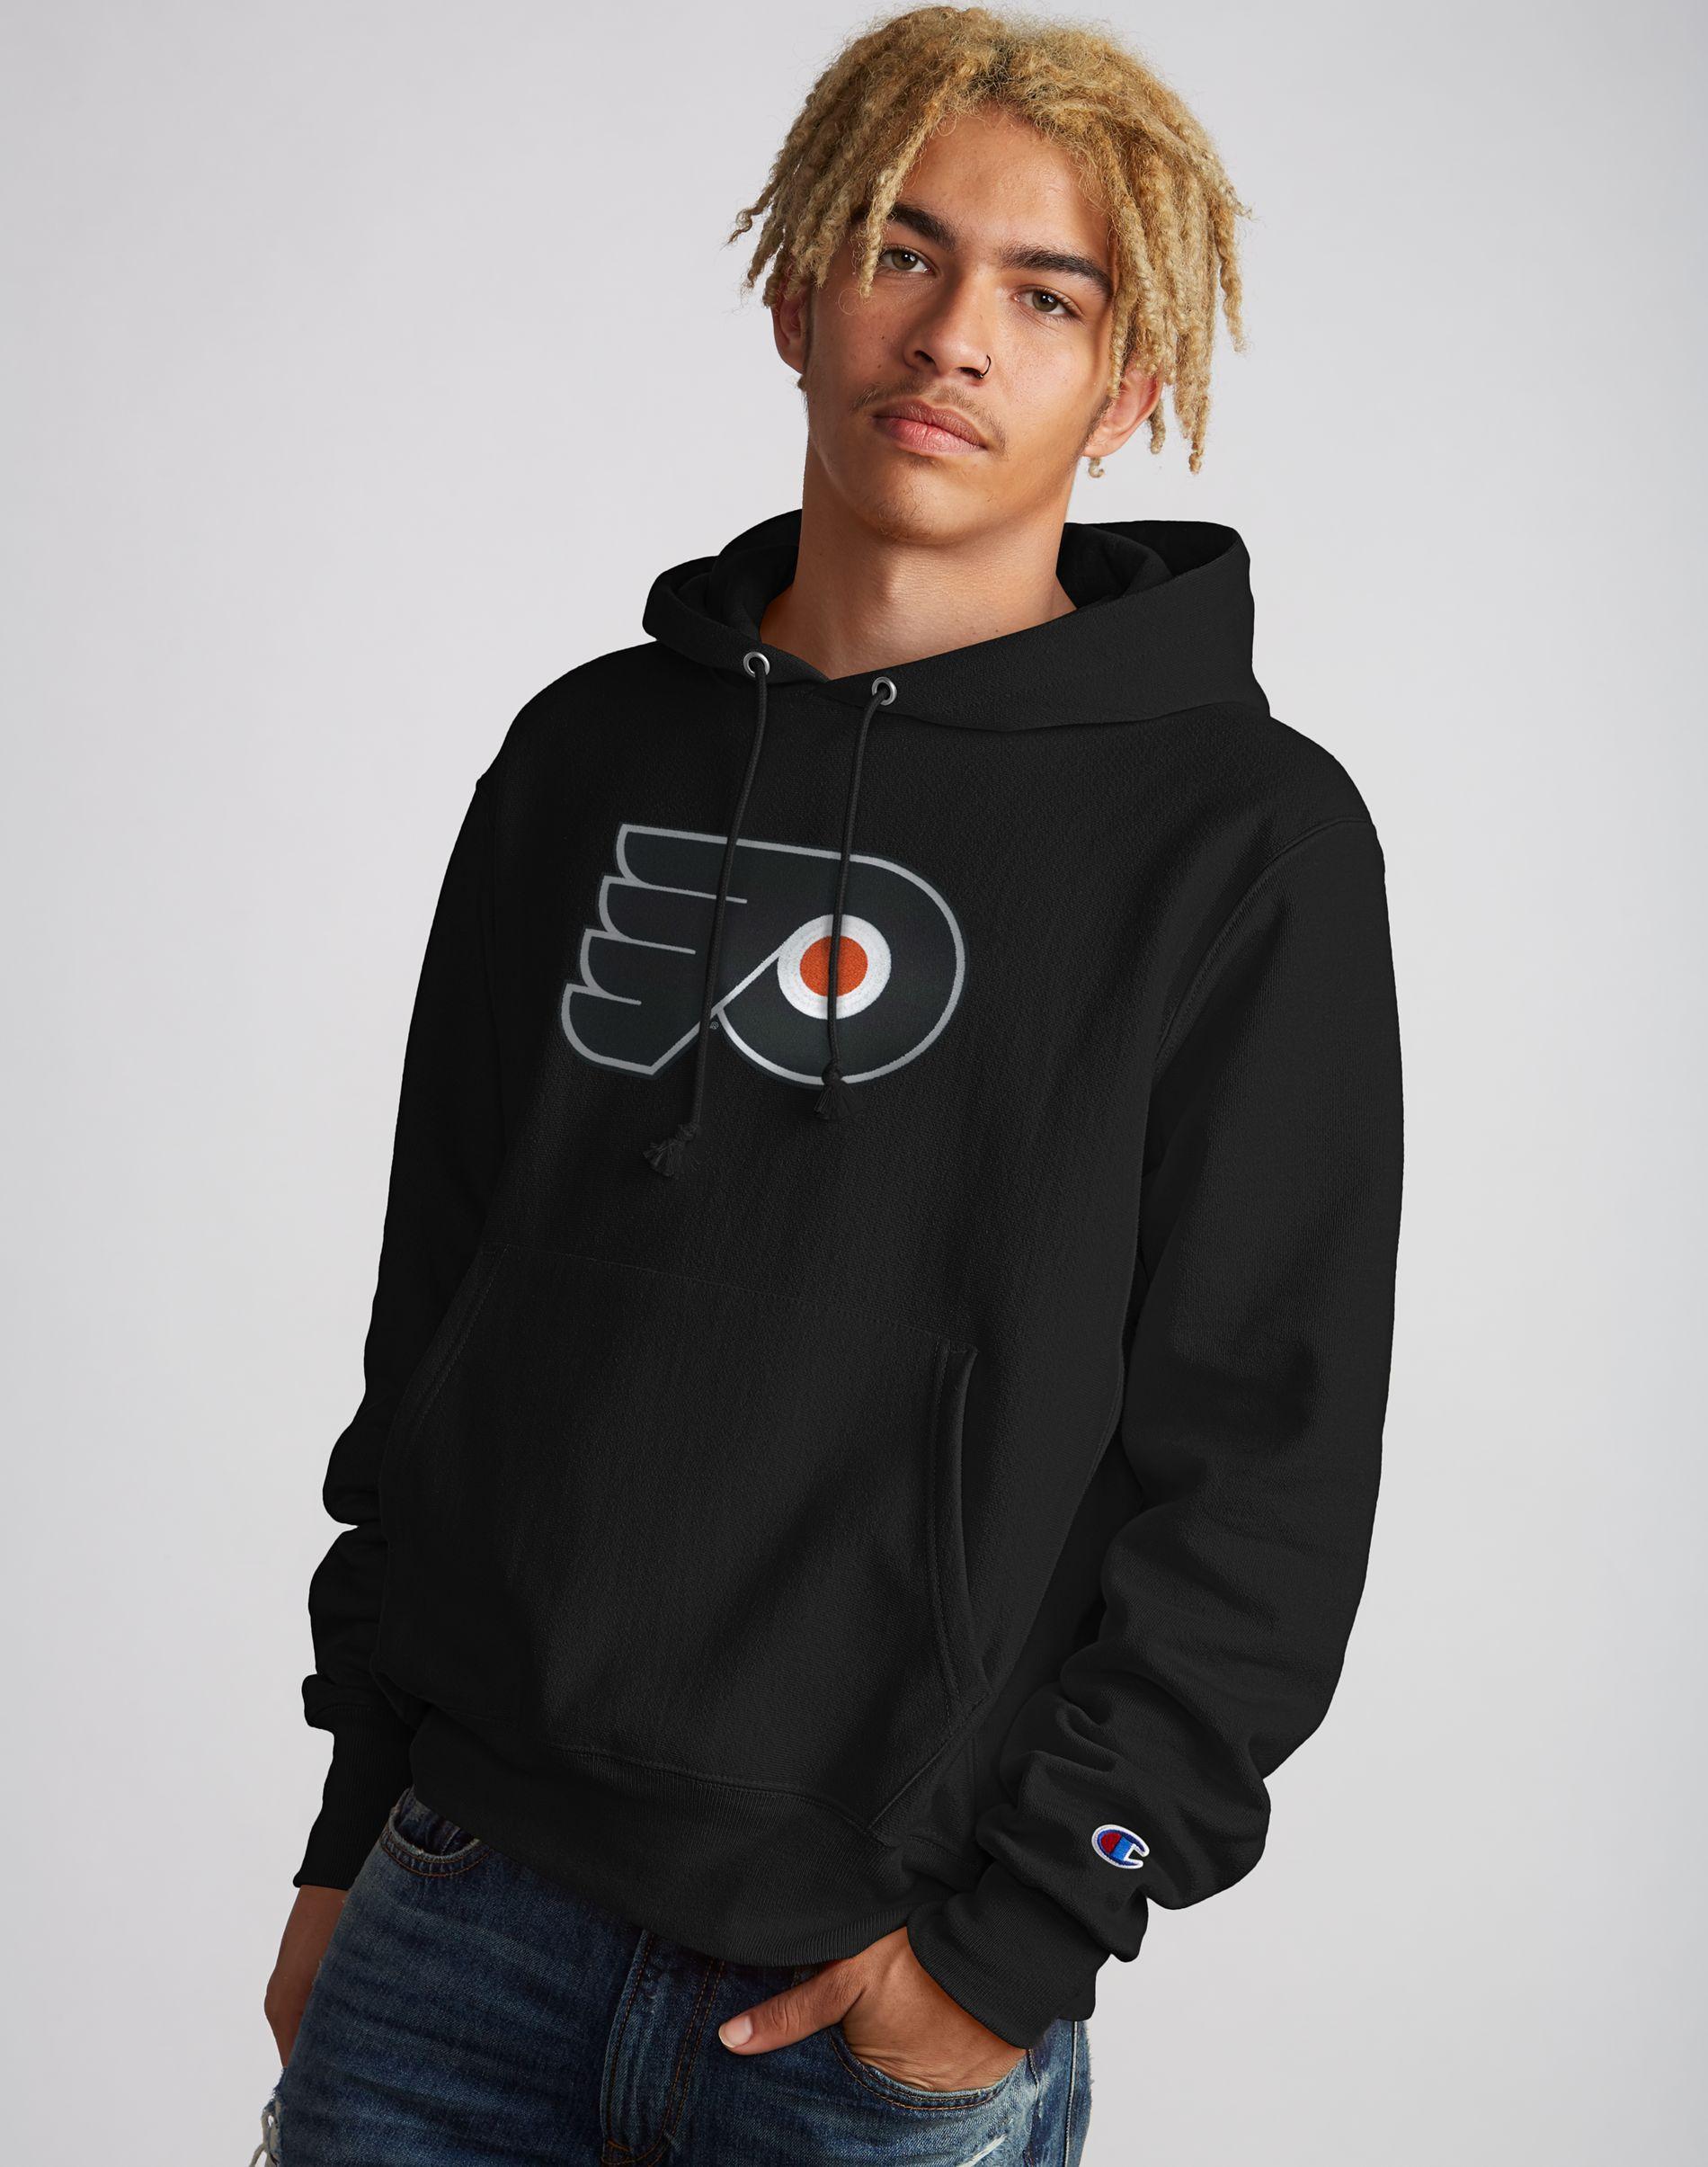 ee567d59 Lyst - Champion Exclusive Life® Reverse Weave® Nhl Hoodie, Philadelphia  Flyers Vintage Marks Series 1967-68 in Black for Men